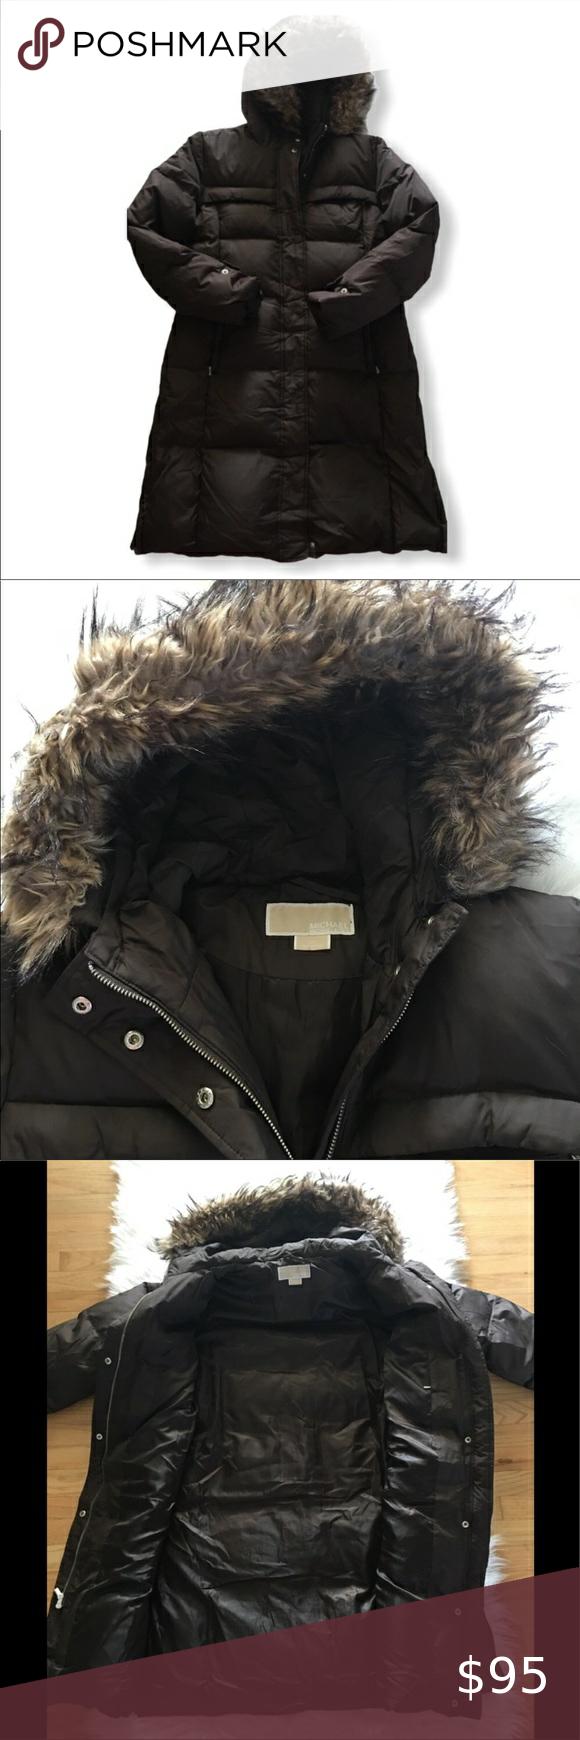 Michael Kors Espresso Puffy Trench Coat Size Large Trench Coat Michael Kors Jackets Michael Kors [ 1740 x 580 Pixel ]